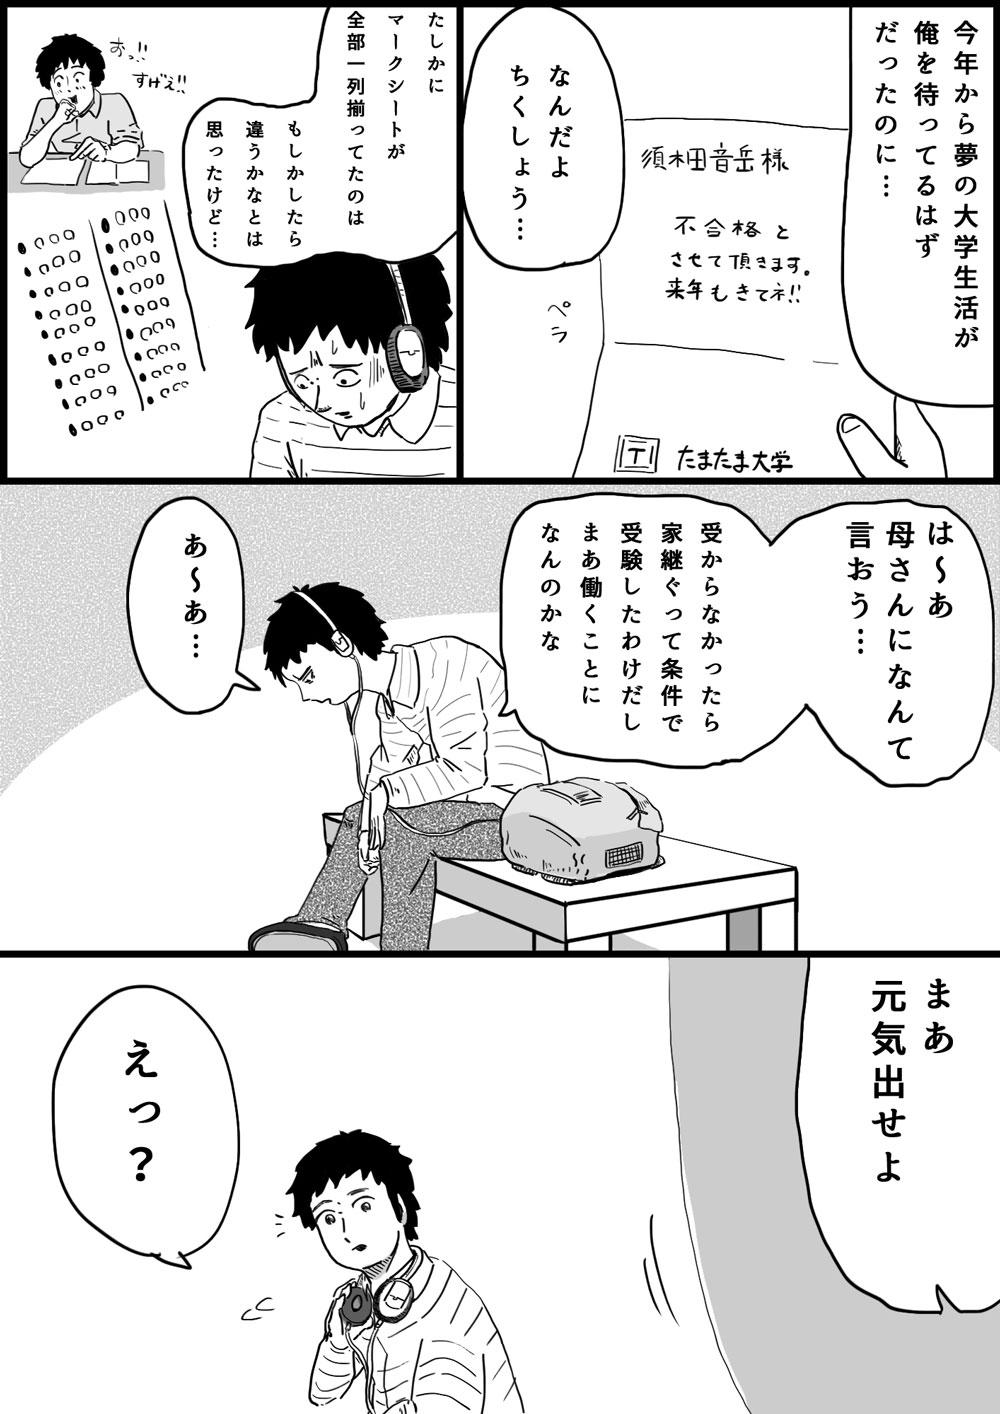 arnolds-hasegawa-001-2